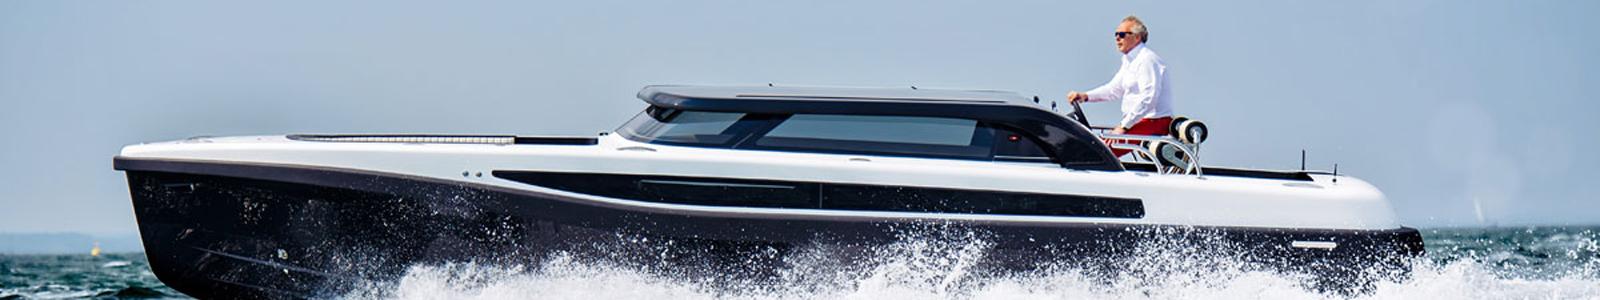 Tailor made superyacht fenders - tender fender systems